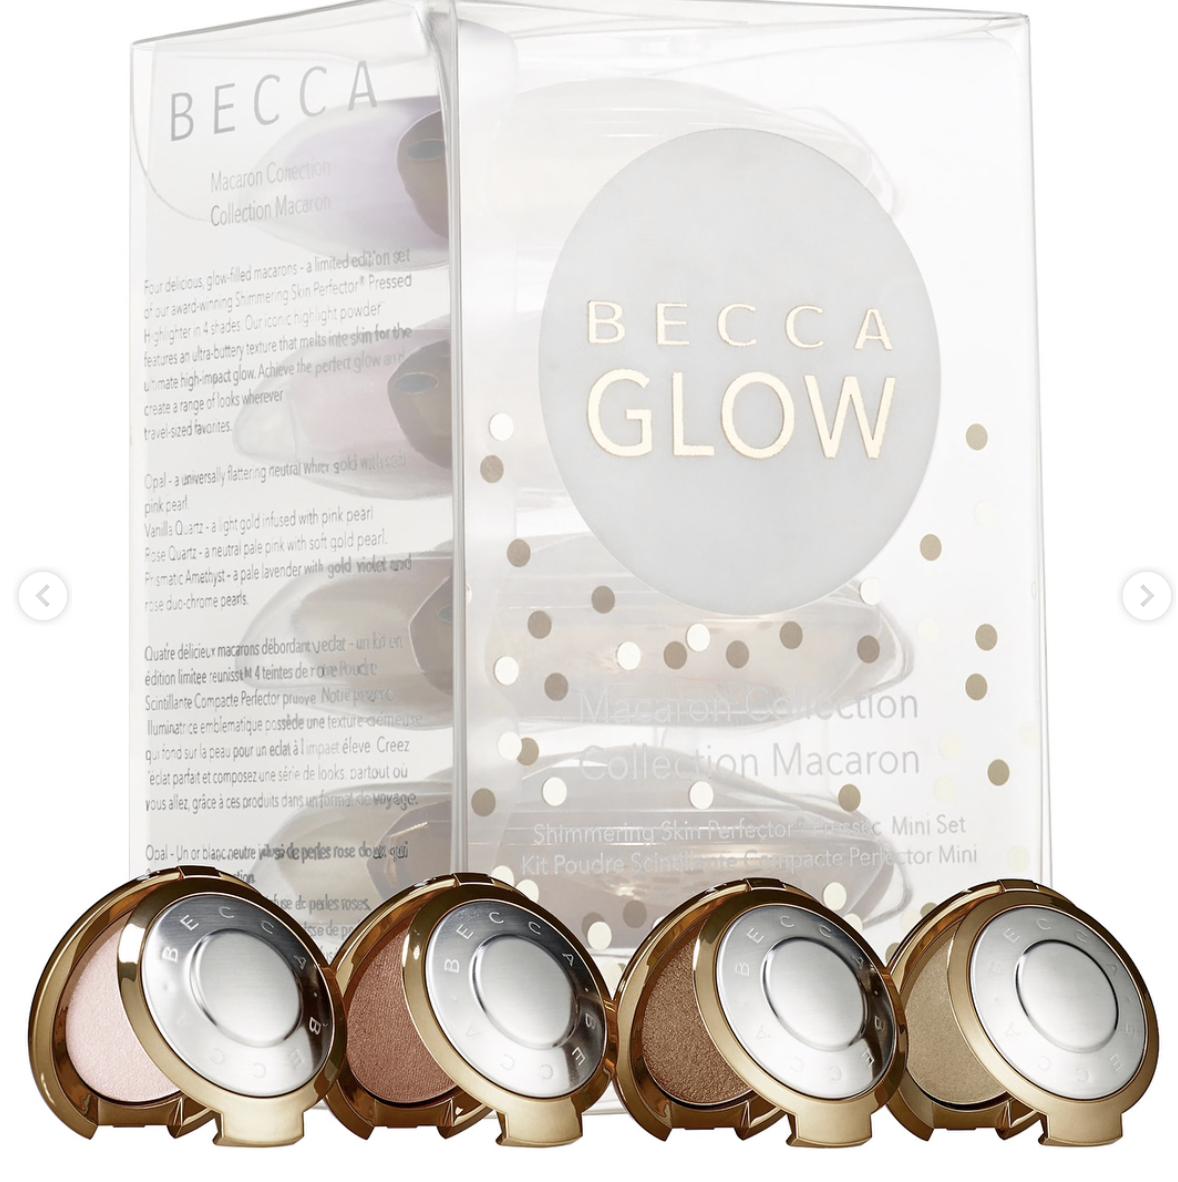 Shimmering Skin Perfector Mini Macaron Set - BECCA Cosmetics - 40$ US